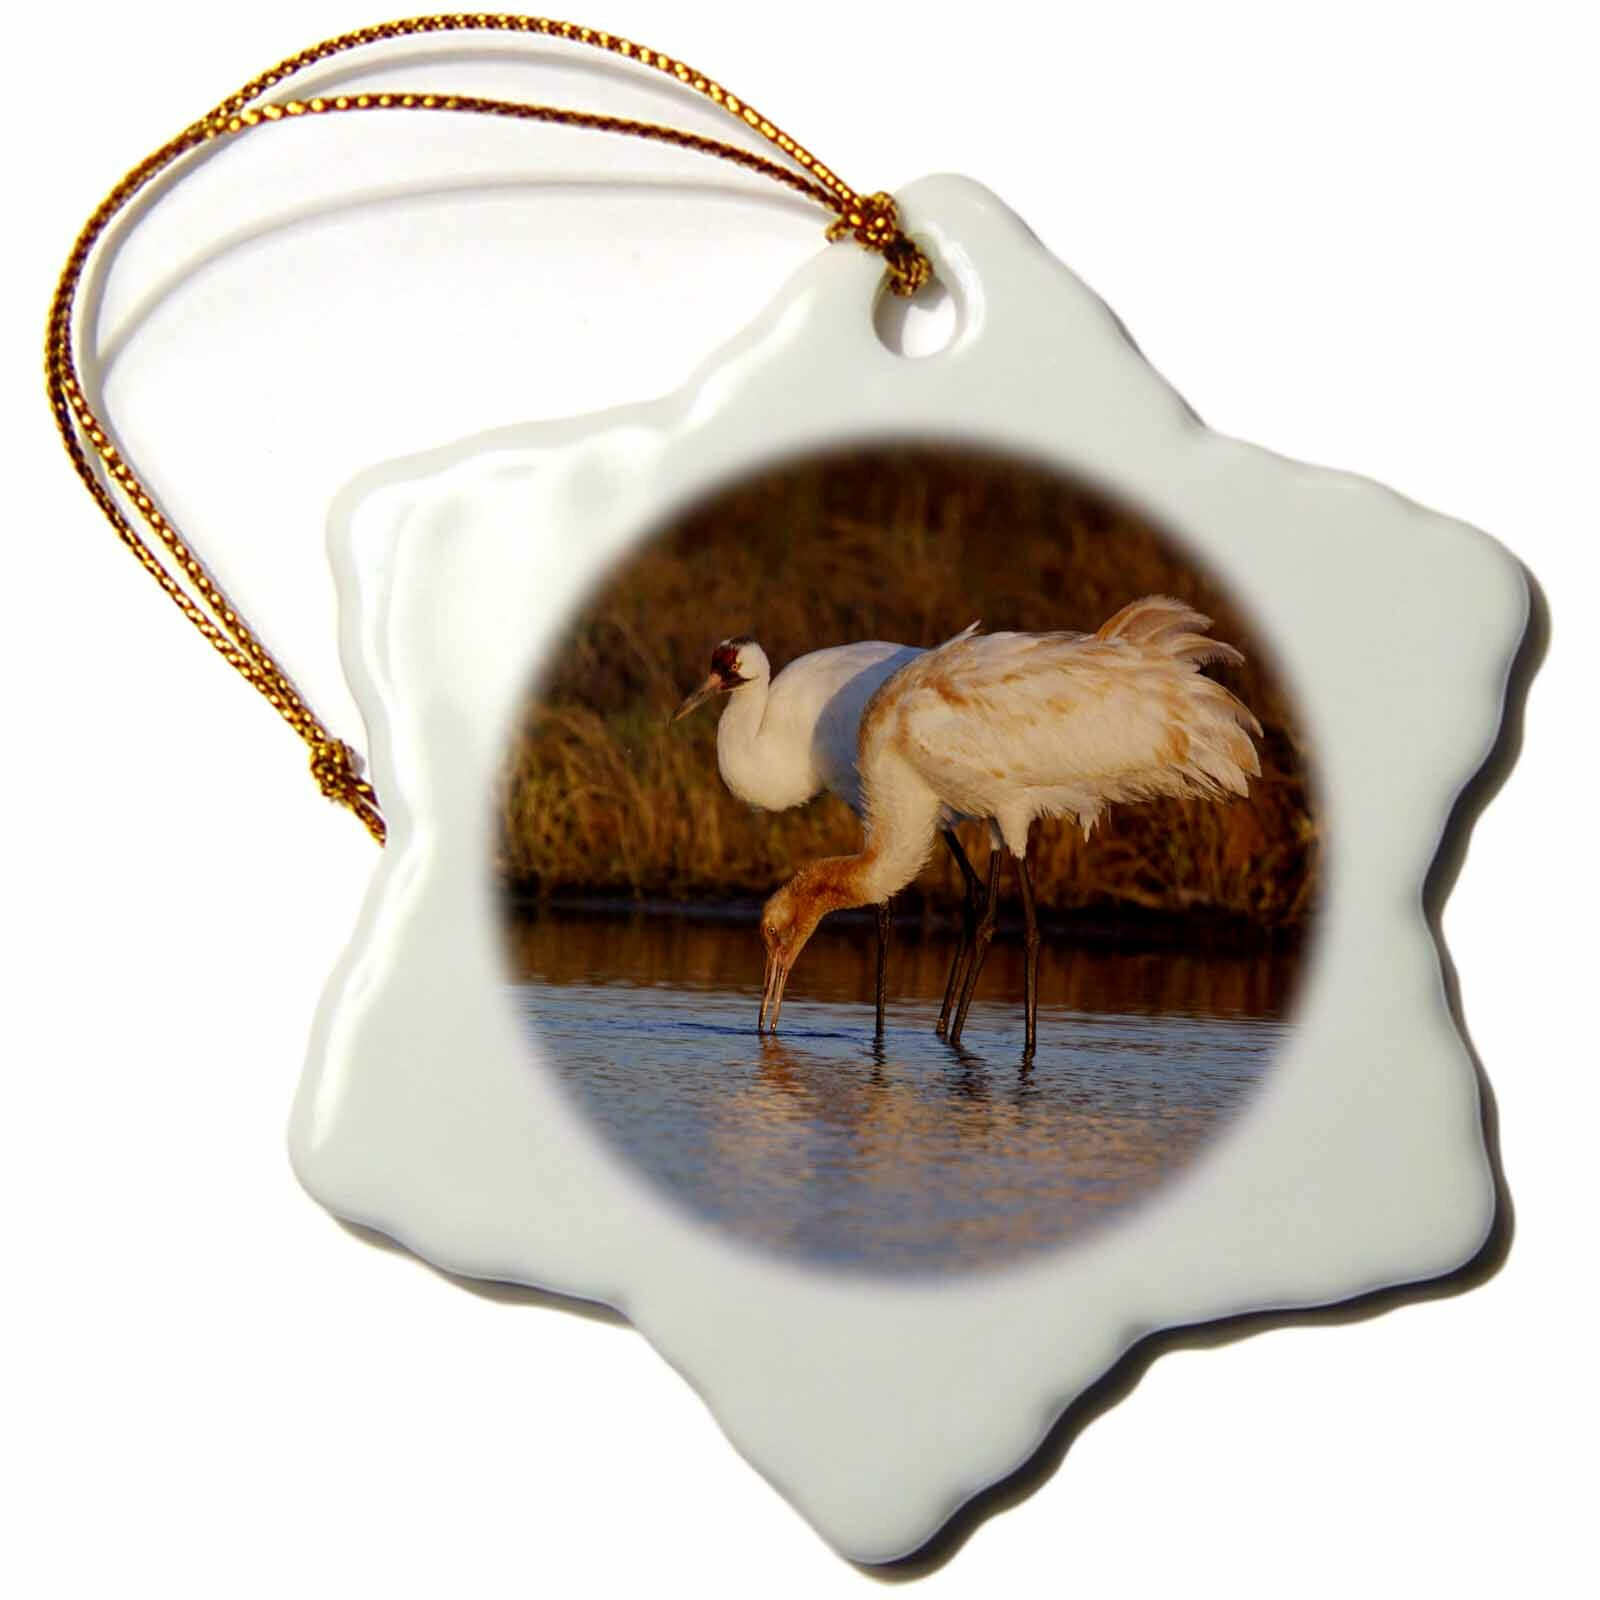 The Holiday Aisle Whooping Crane Bird Aransas Refuge Texas Usa Snowflake Holiday Shaped Ornament Wayfair